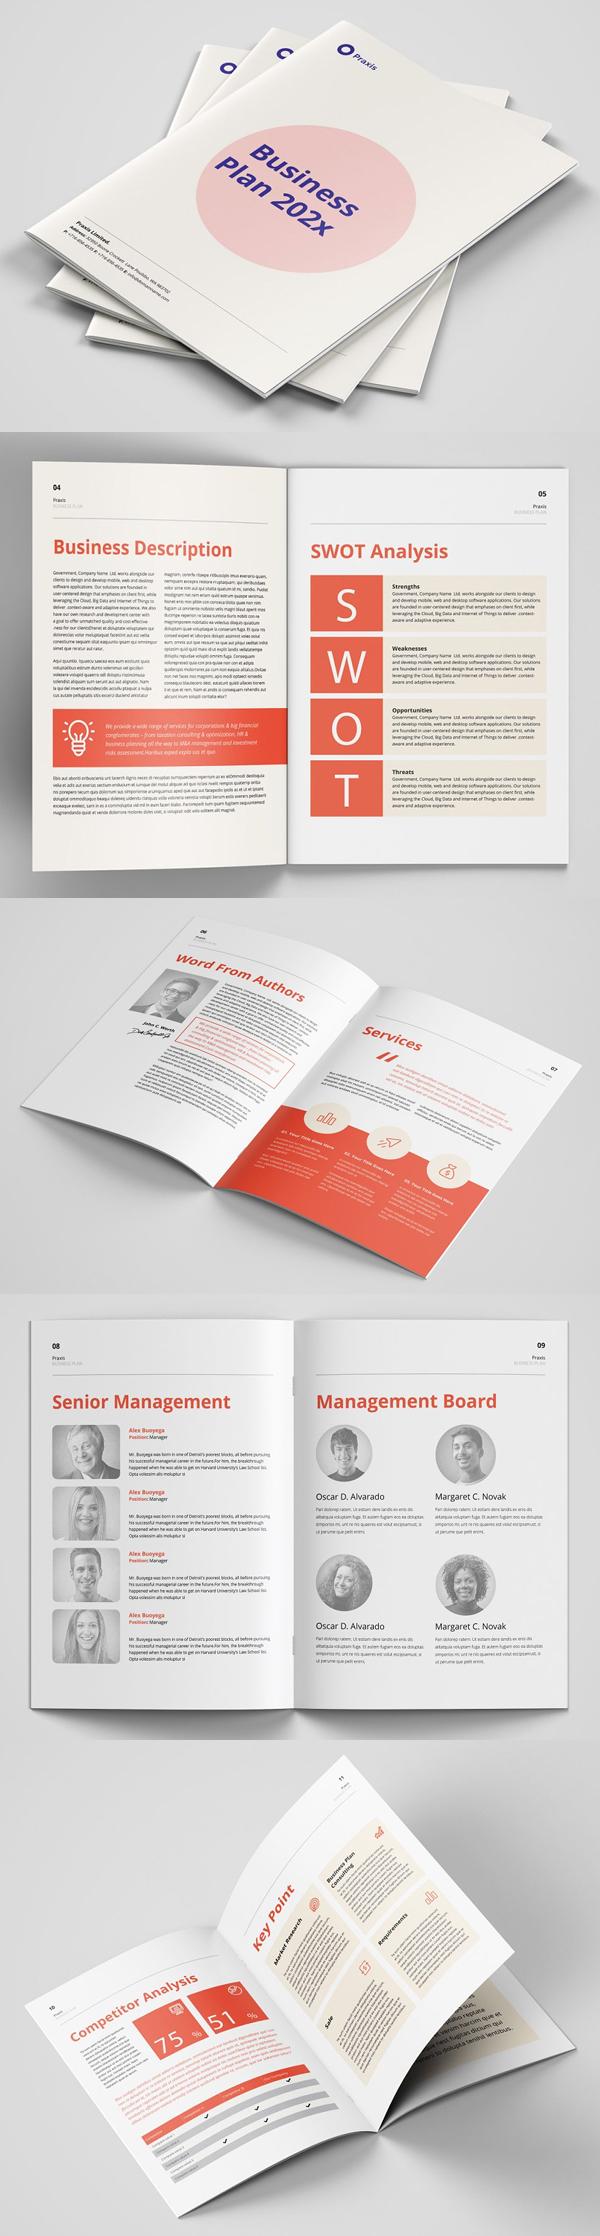 Business Plan Guild Brochure Design